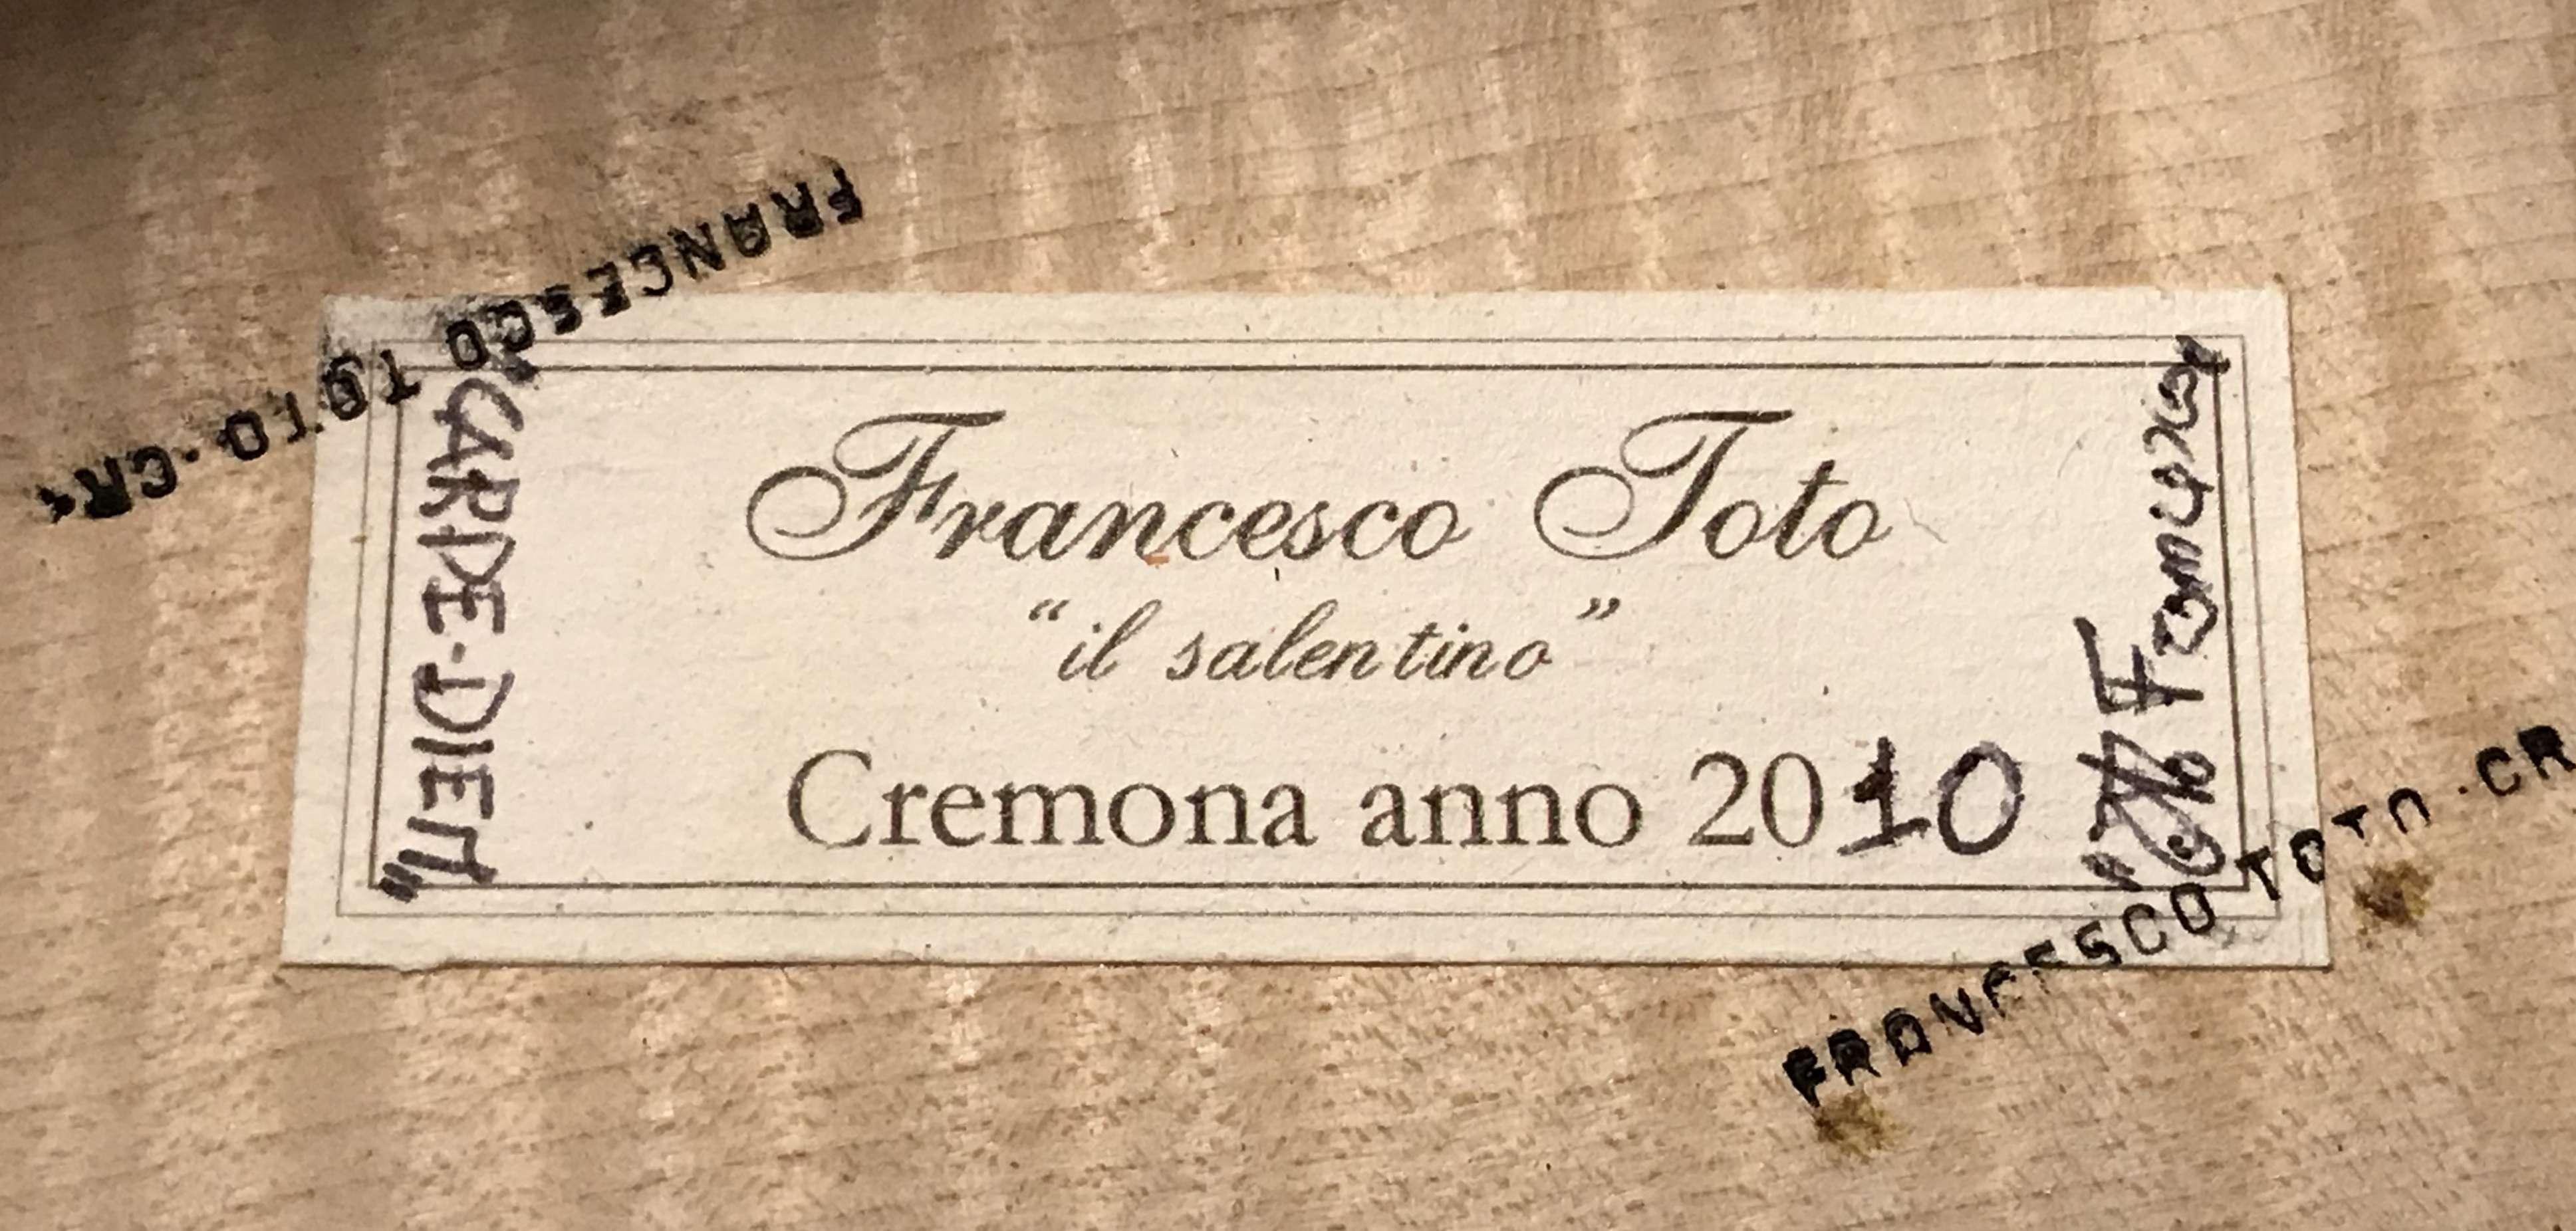 Francesco Toto cello cremona